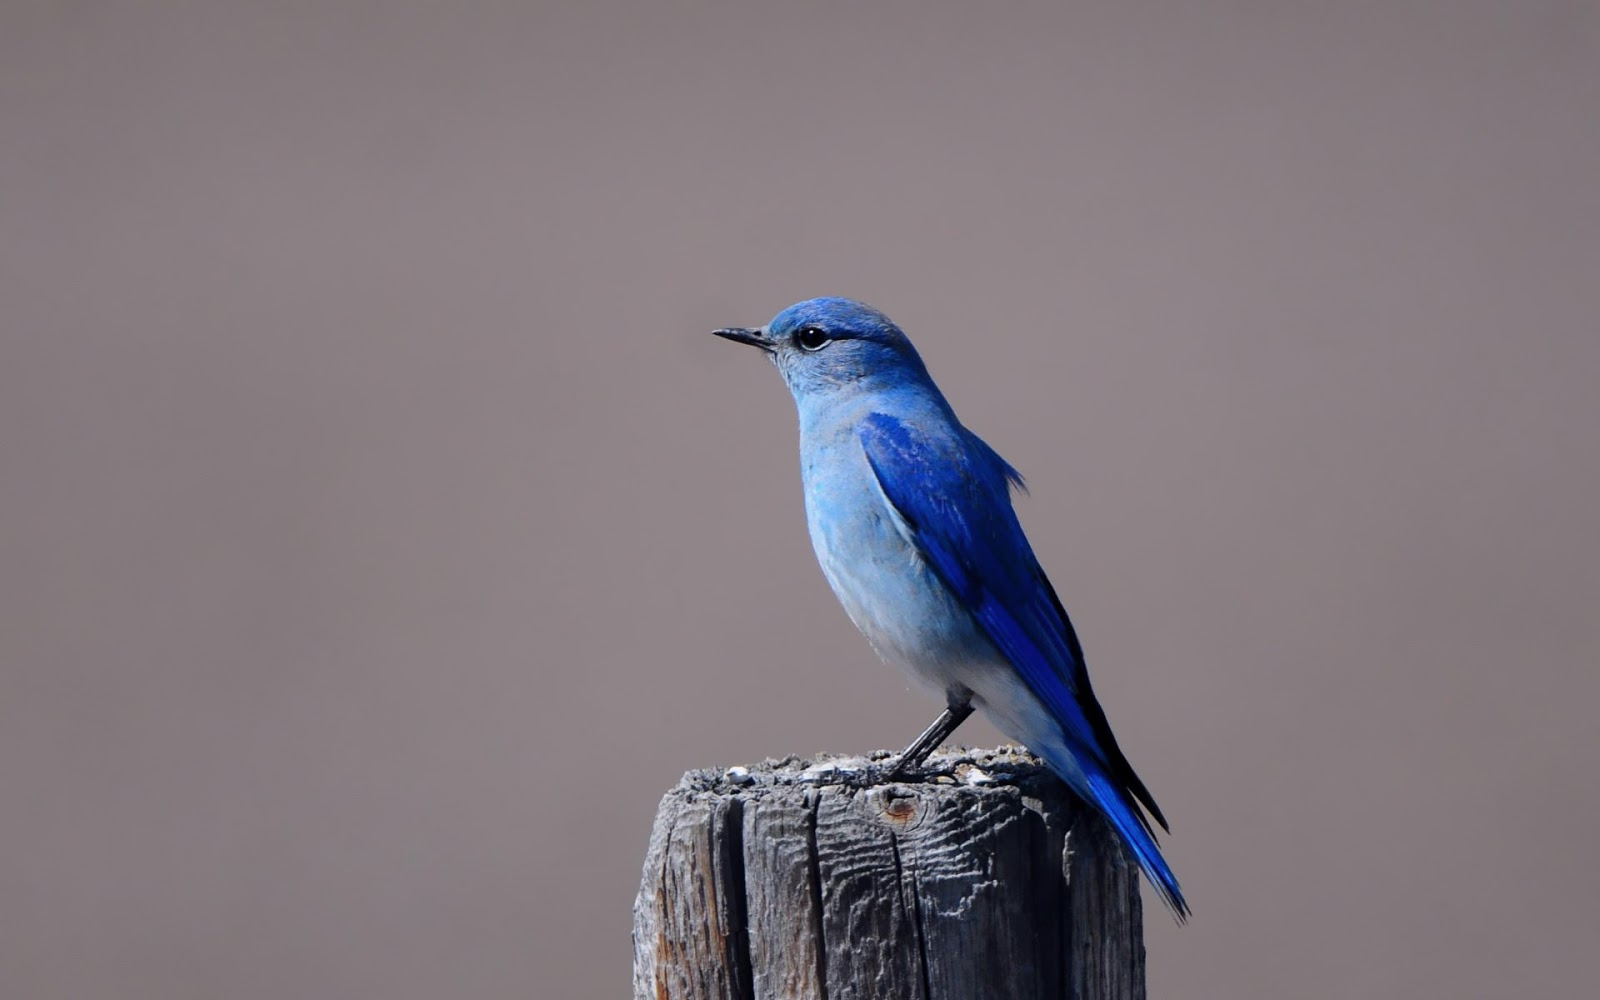 Blue bird sitting on a pole wallpaper HD Animals Wallpapers 1600x1000